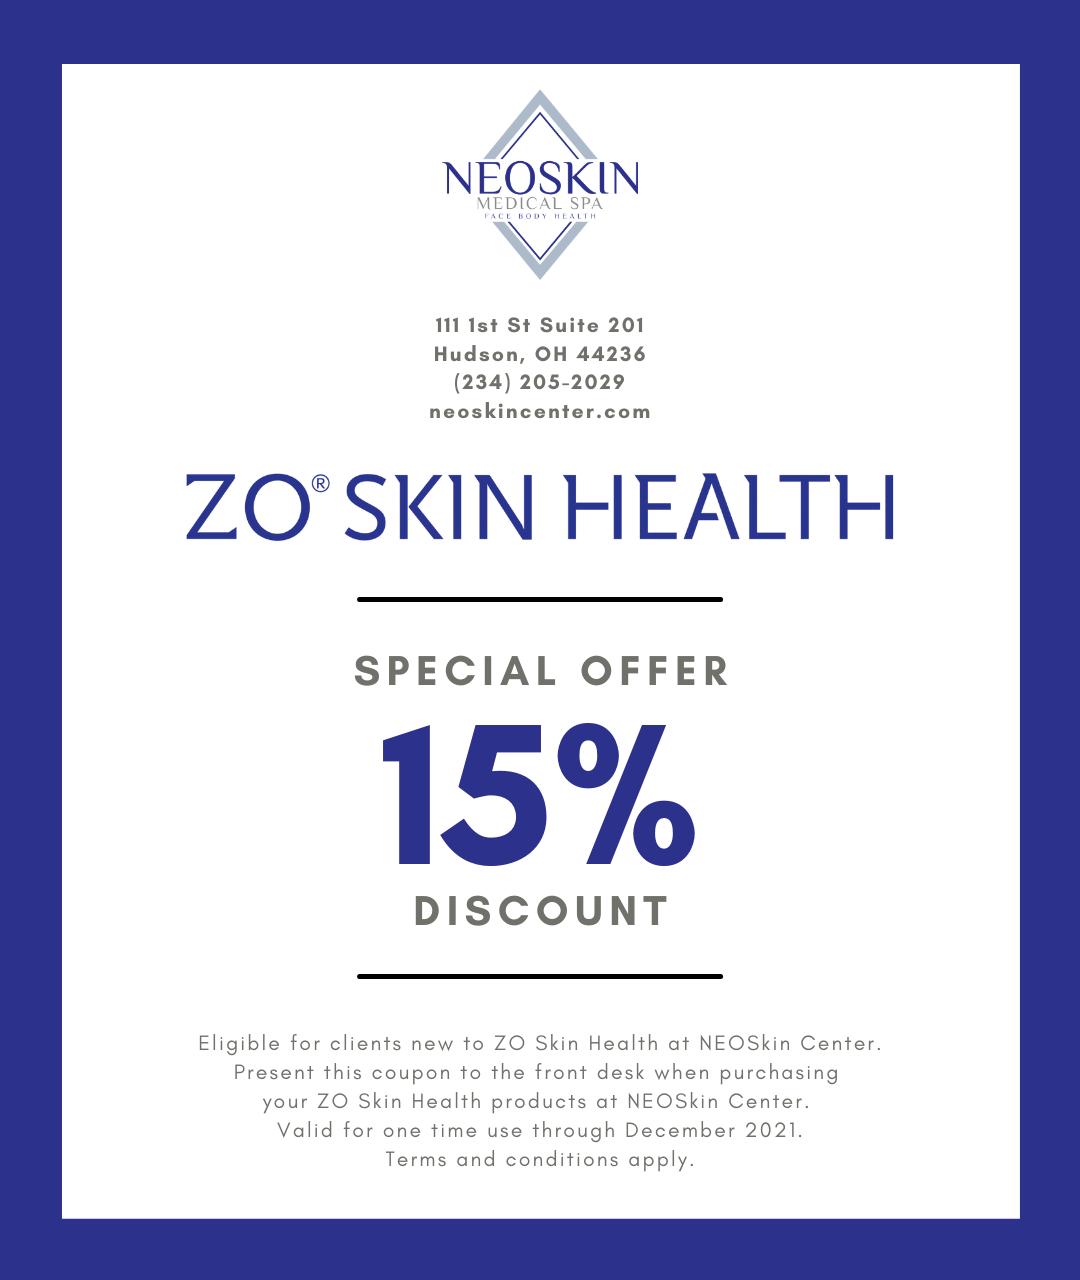 ZO Skin Health At NEOSKIN Center - Digital Coupon